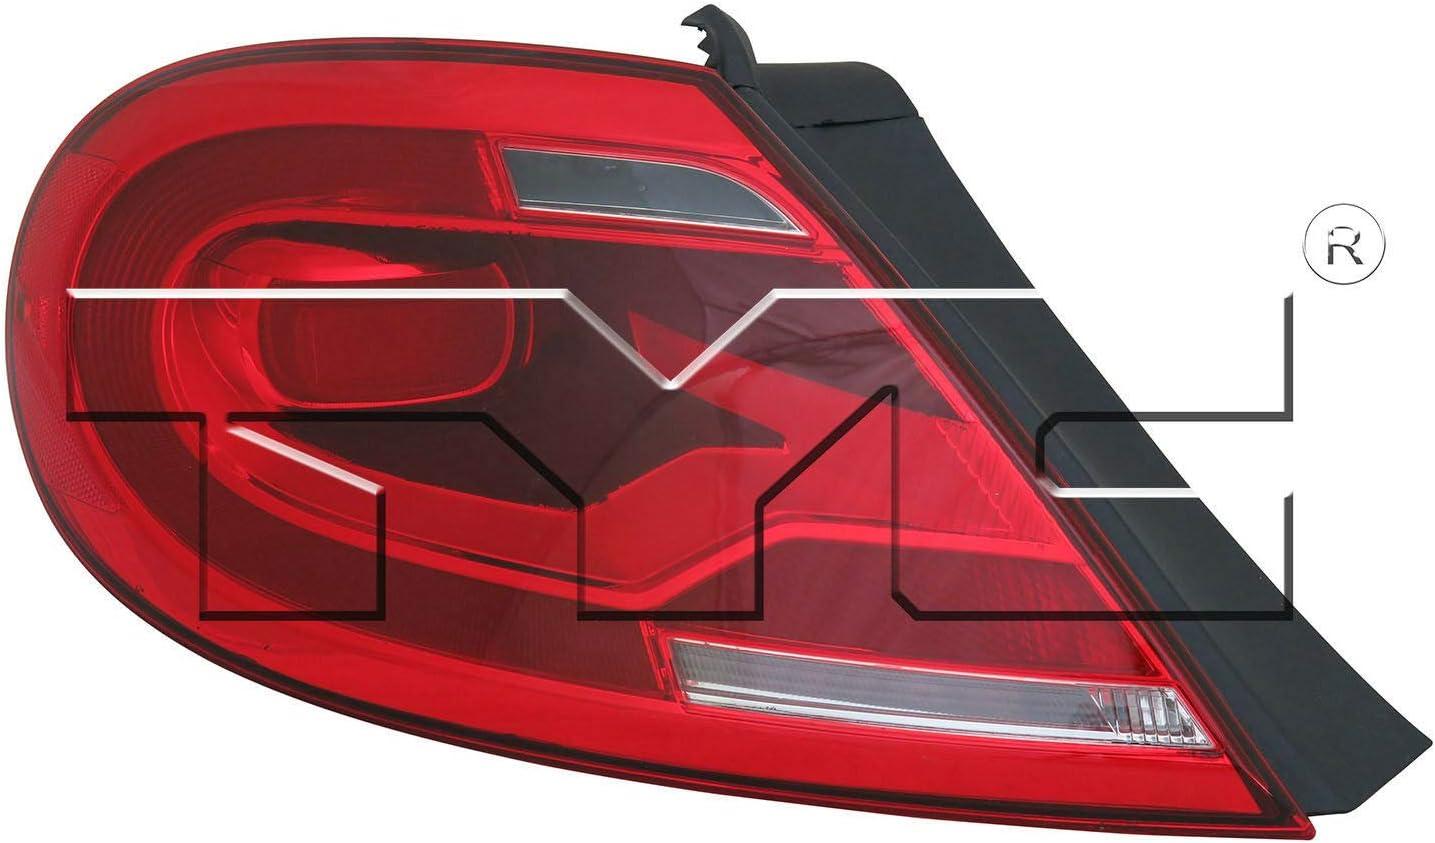 Pro Braking PBR4703-CAR-GRE Rear Braided Brake Line Carbolook Hose /& Stainless Green Banjos